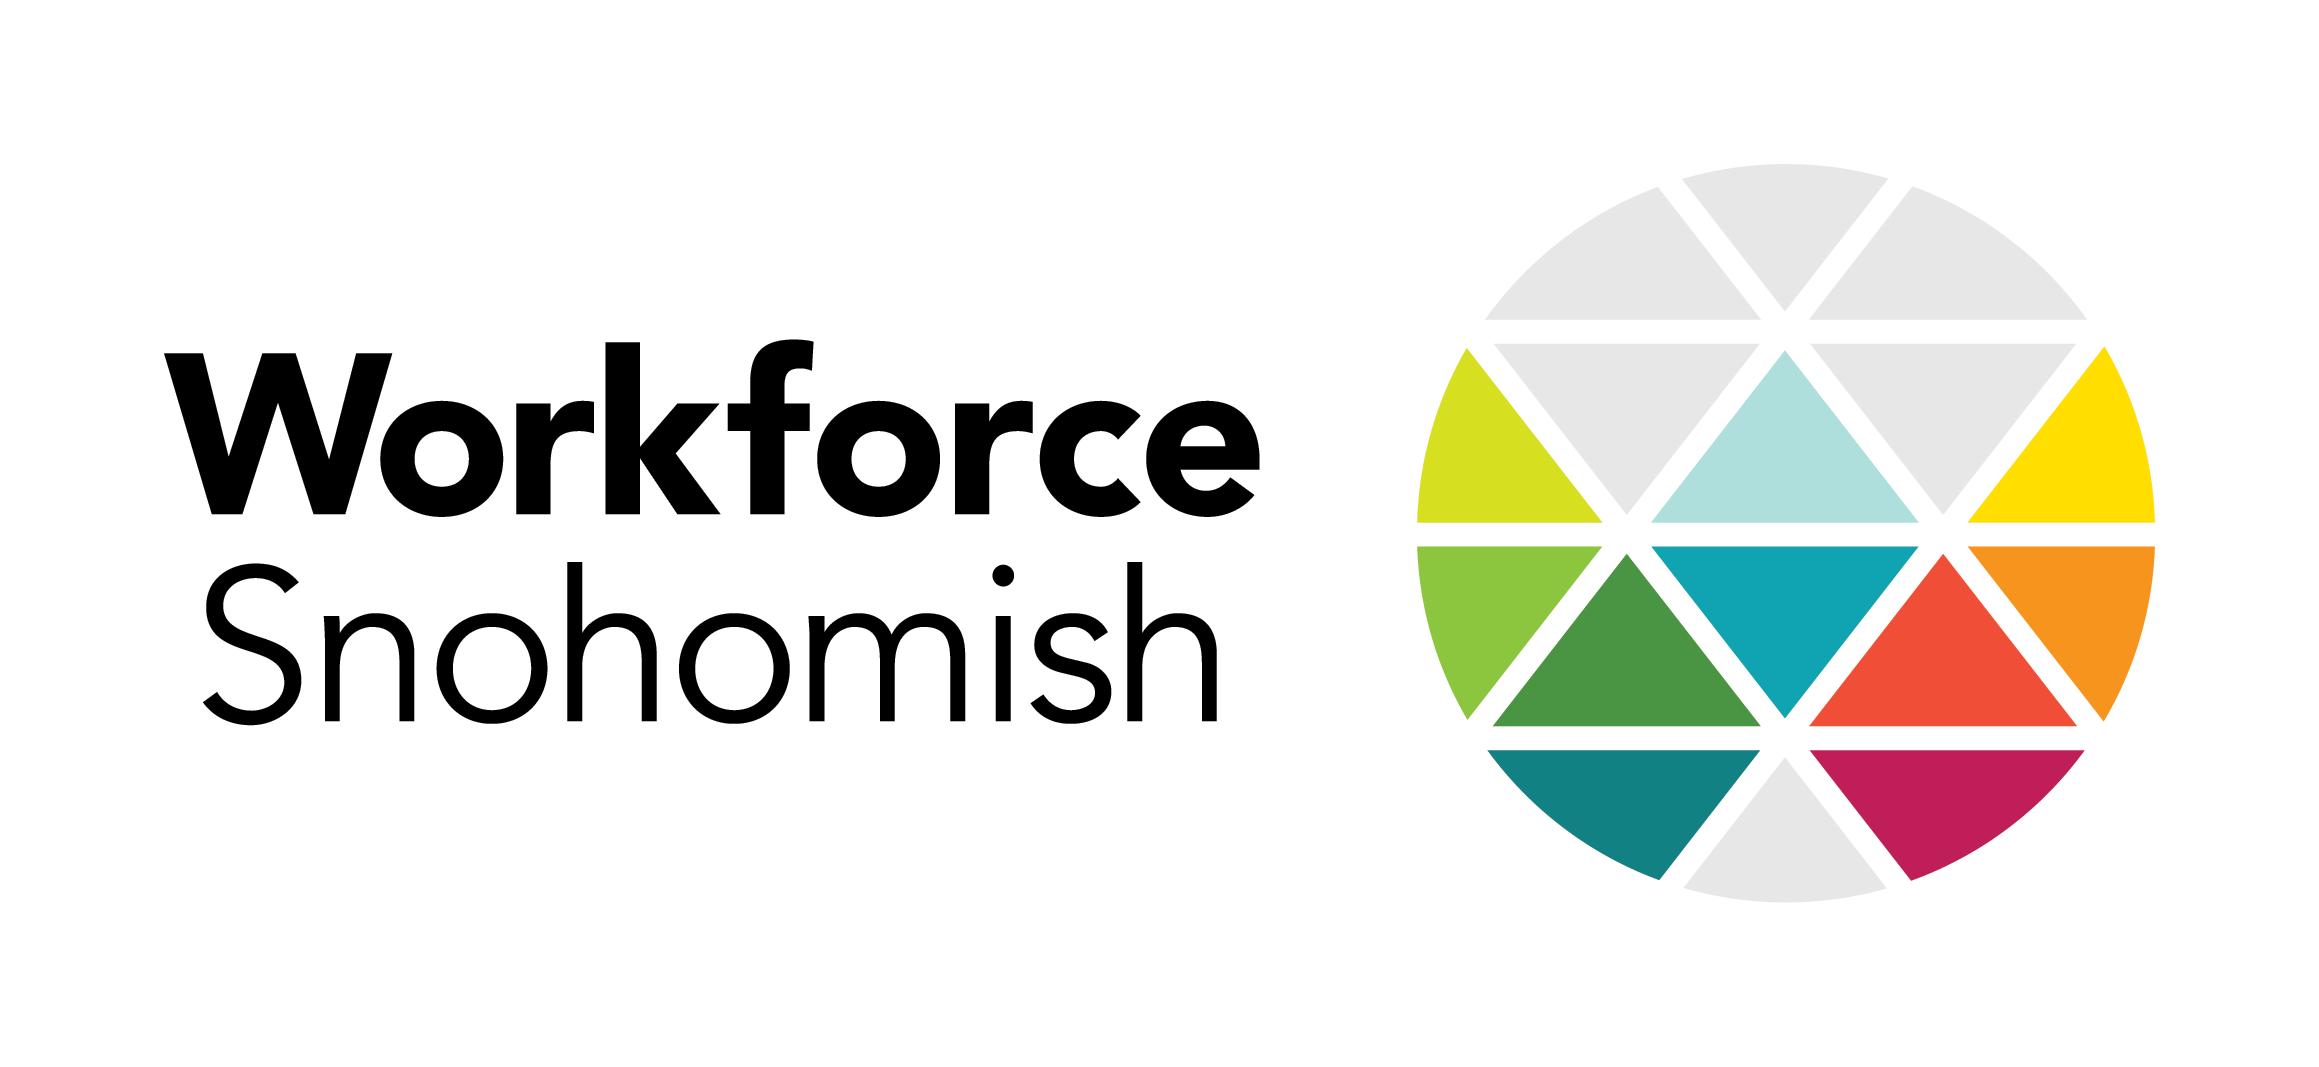 Workforce Snohomish